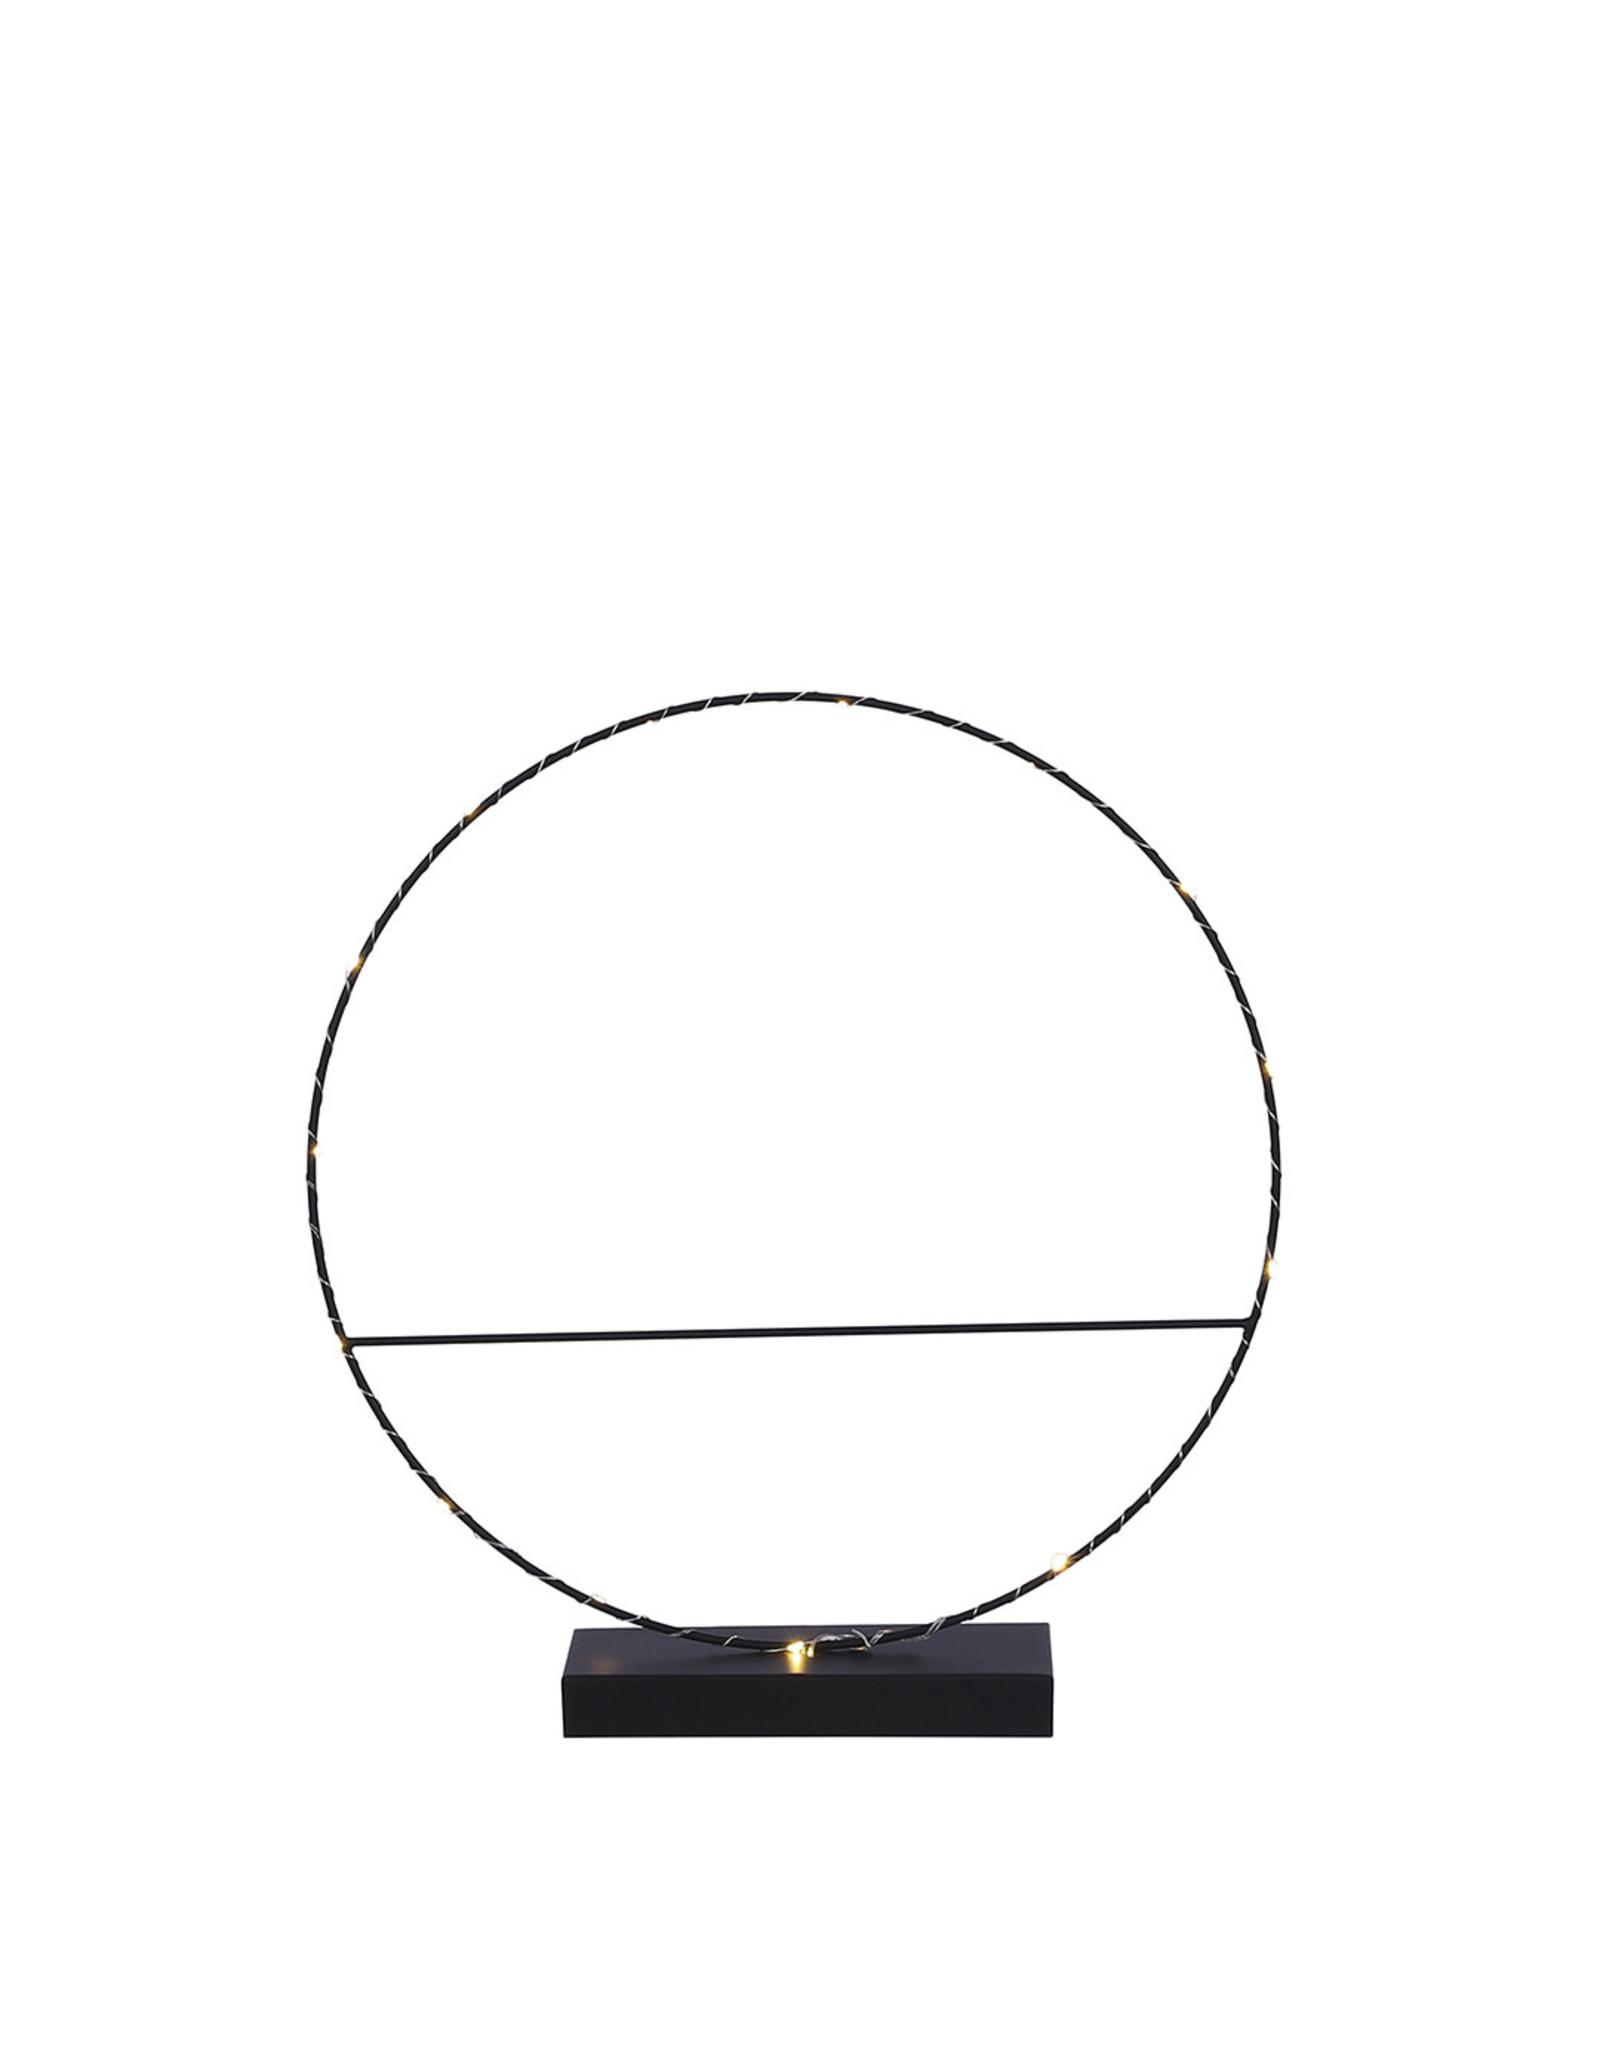 Decoration circle black 15 led battery operated - w7xd40cm